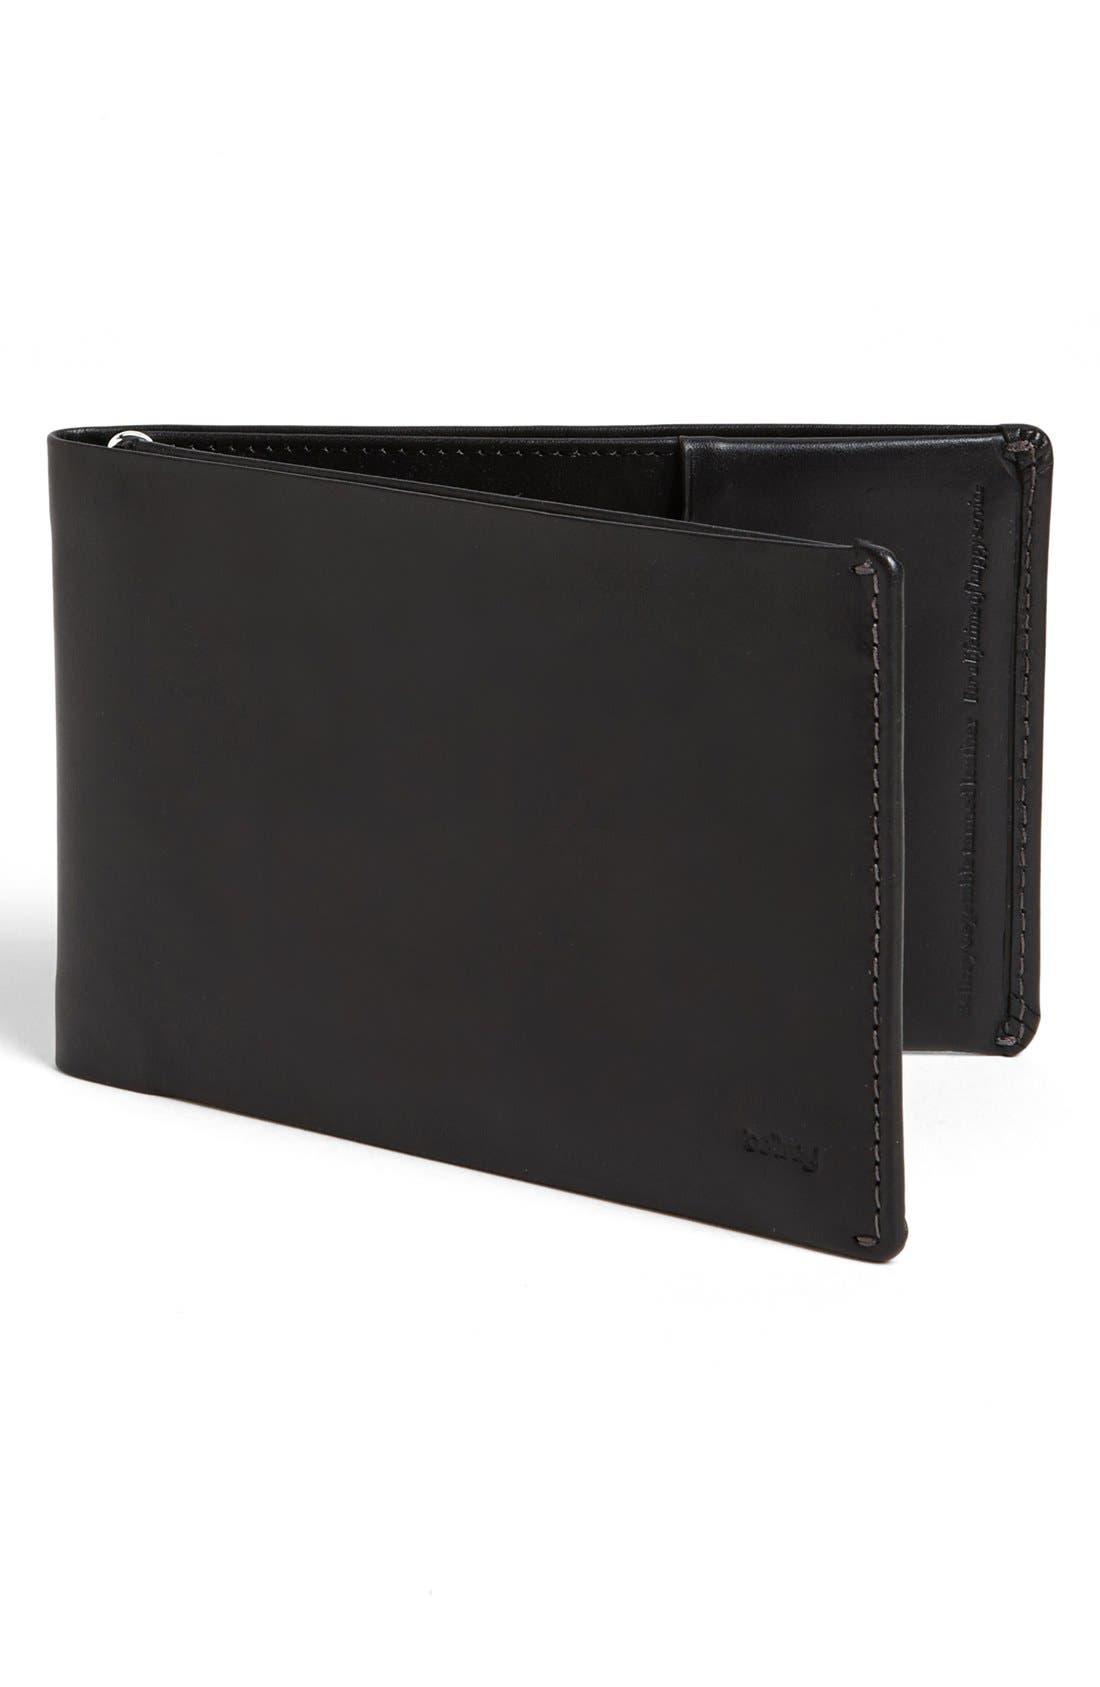 BELLROY,                             Travel Wallet,                             Main thumbnail 1, color,                             001